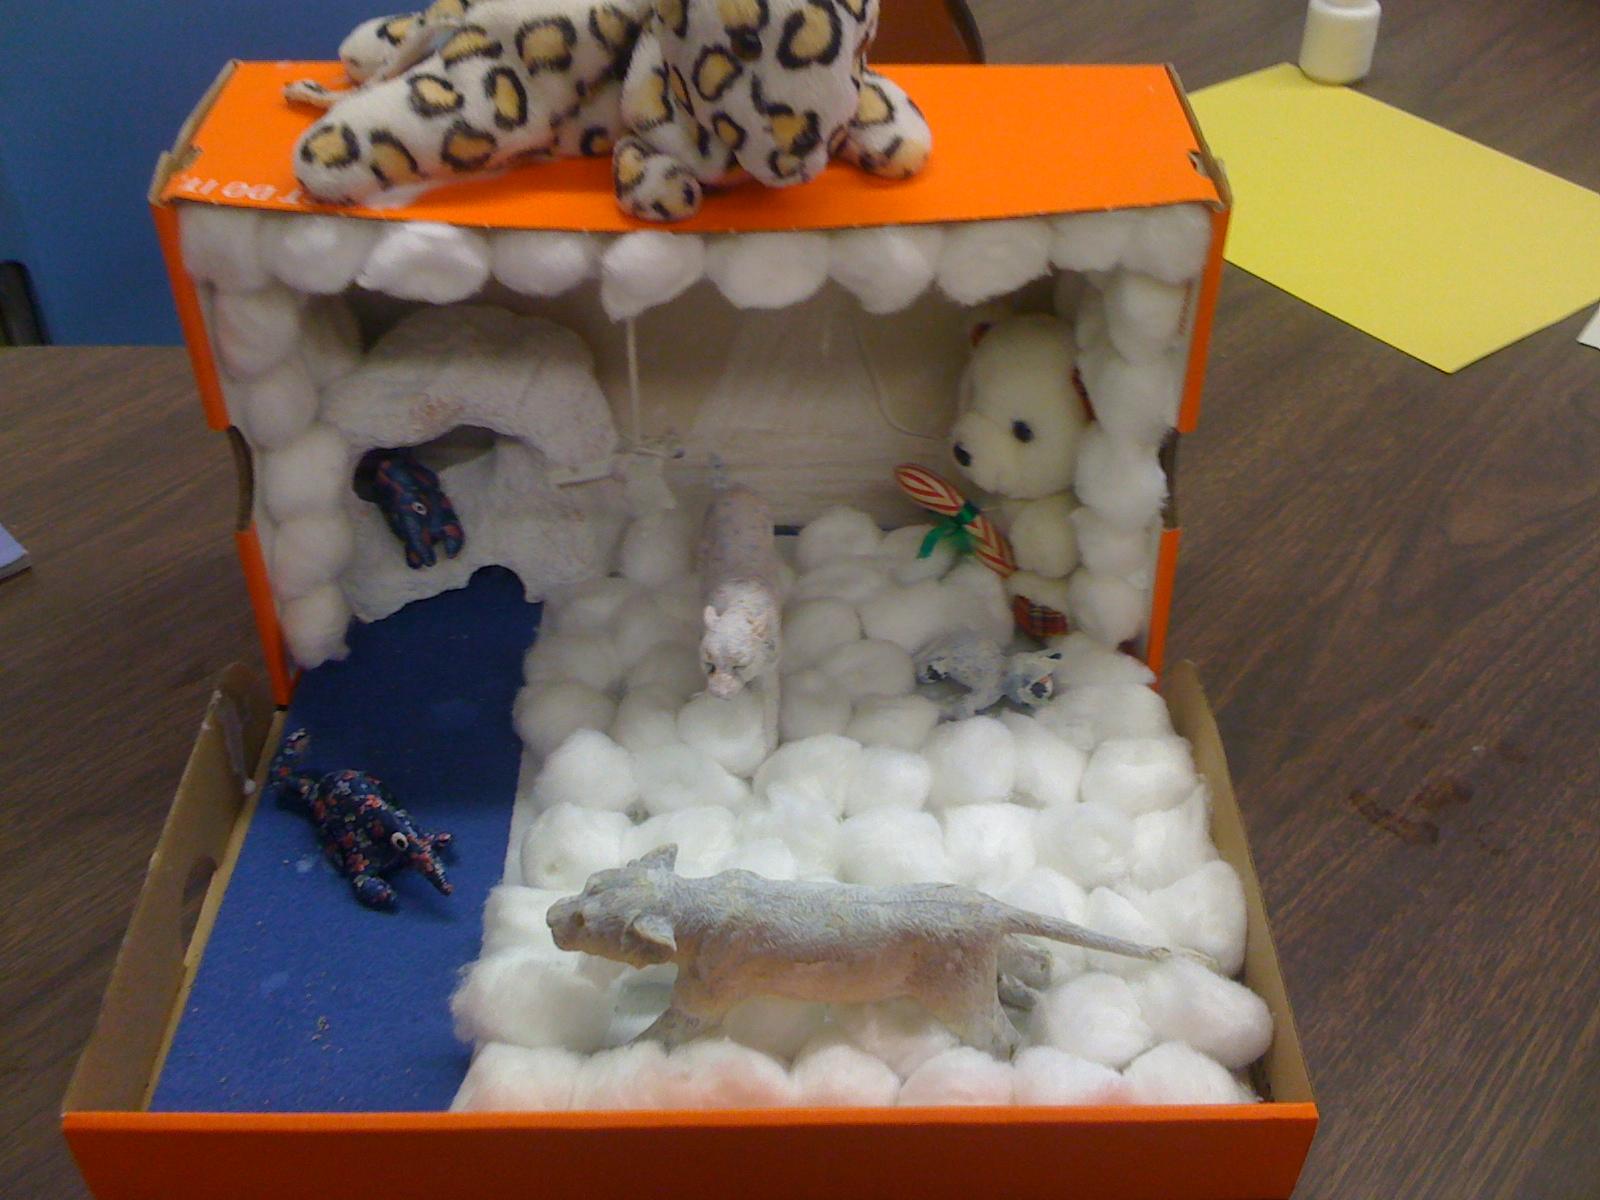 Kids Diorama With Details: Mrs. Cardoso's Class: September 2010